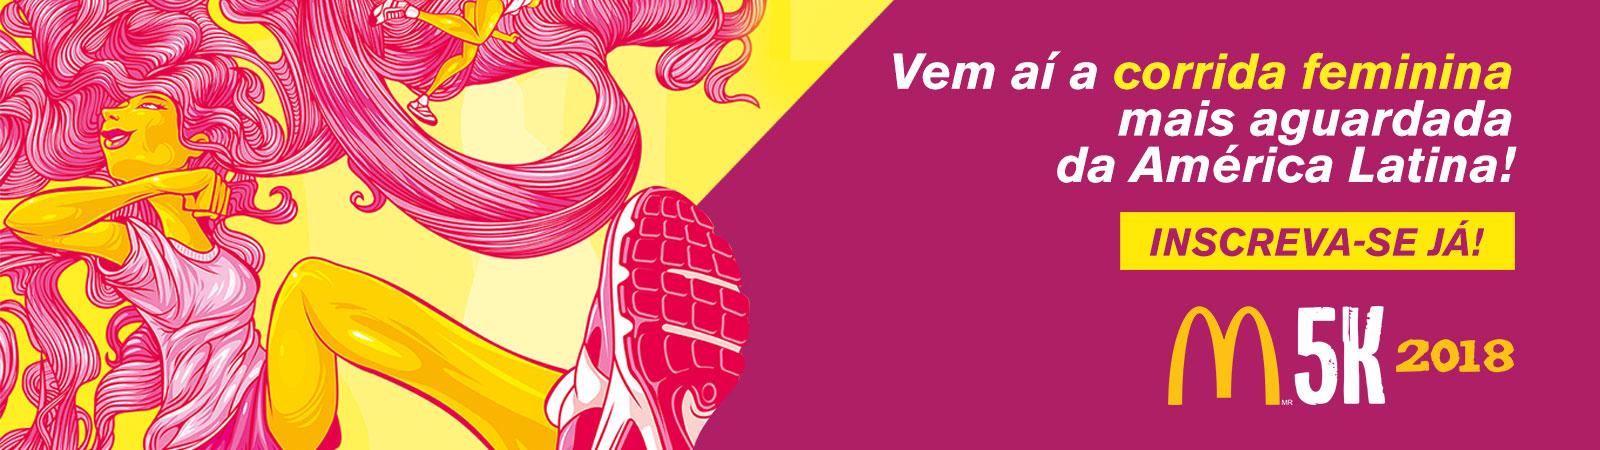 CORRIDA E CAMINHADA FEMININA McDonald's 5K 2018 - BRASÍLIA - Imagem de topo